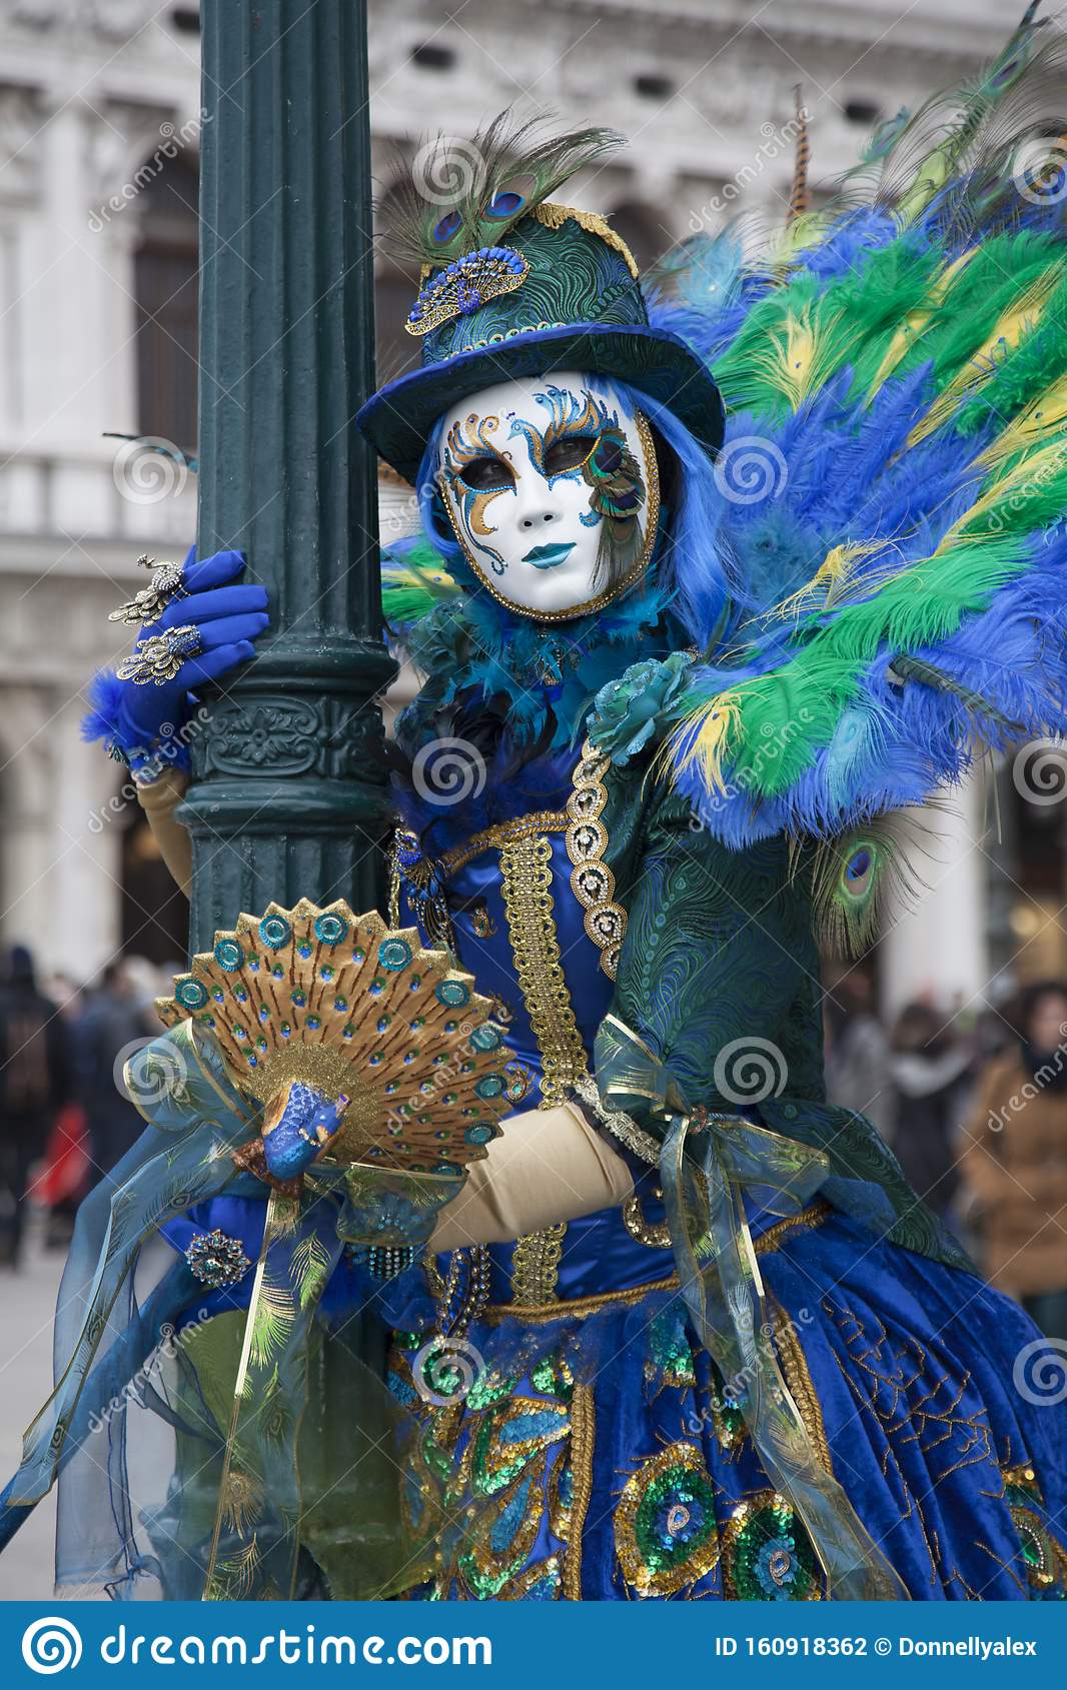 Venice Carnival People Dress In Wonderful Carnival Costumes